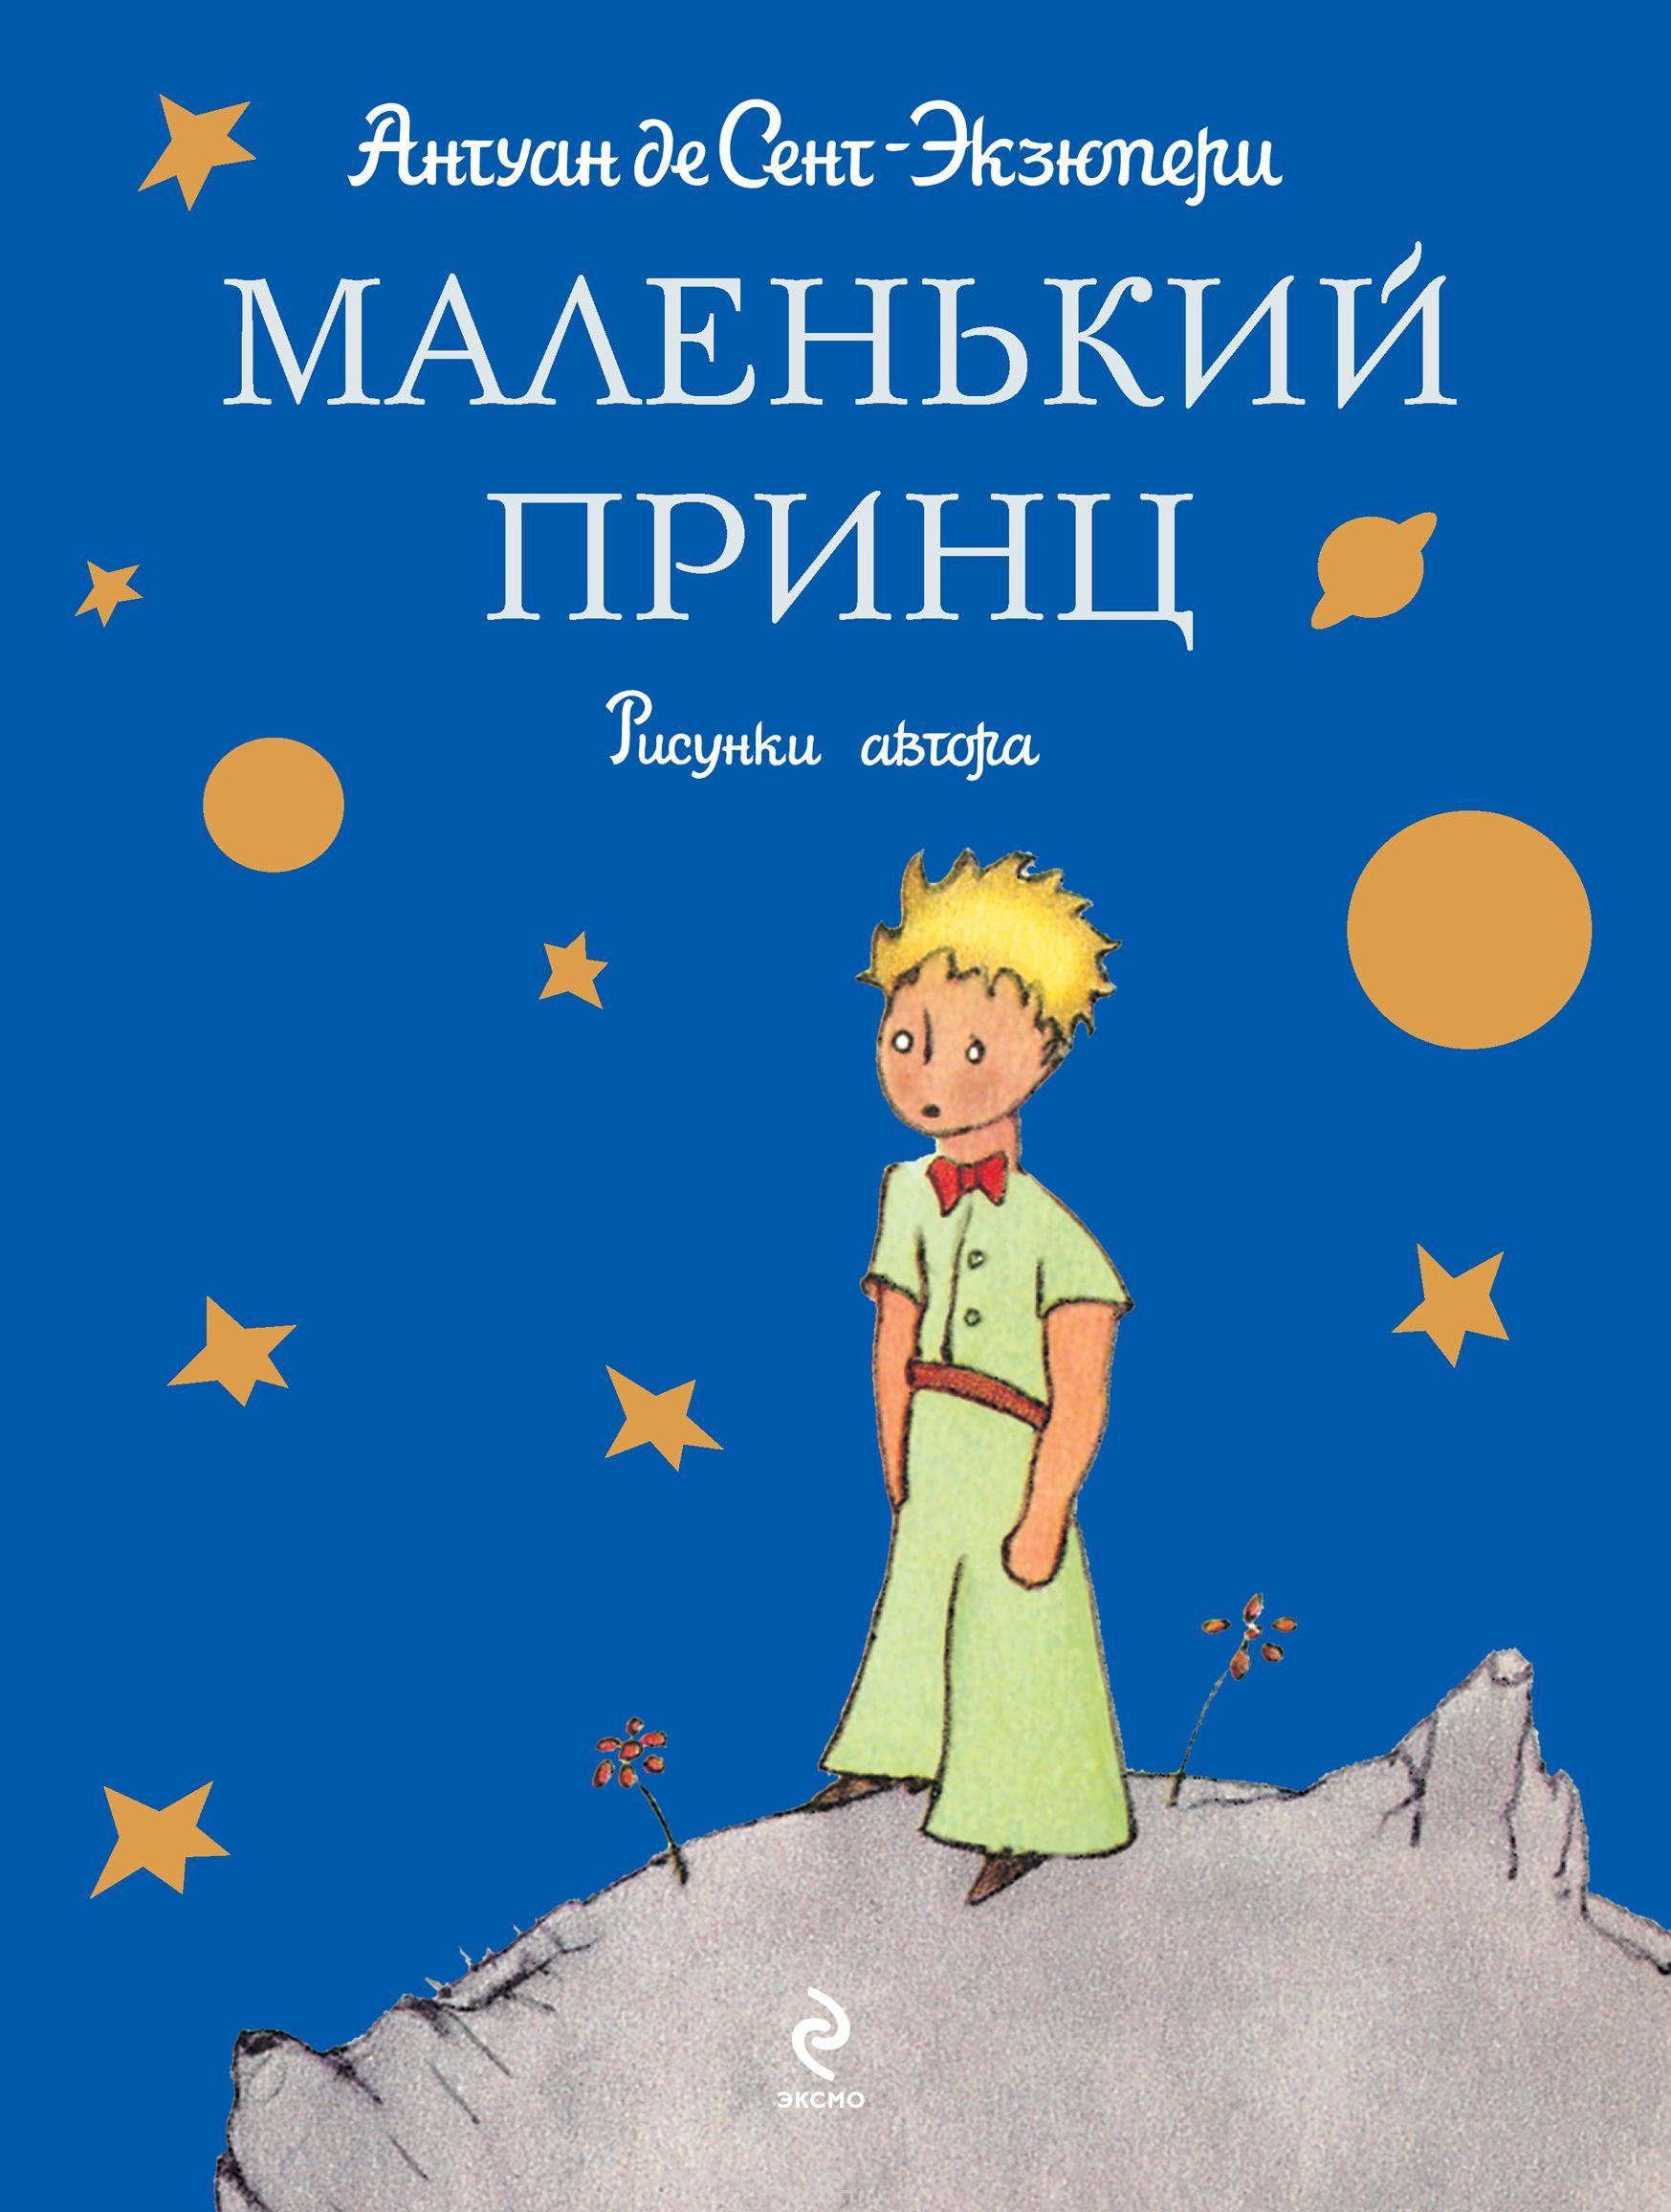 The Little Prince / Антуан Де-Сент Экзюпери. Маленький Принц